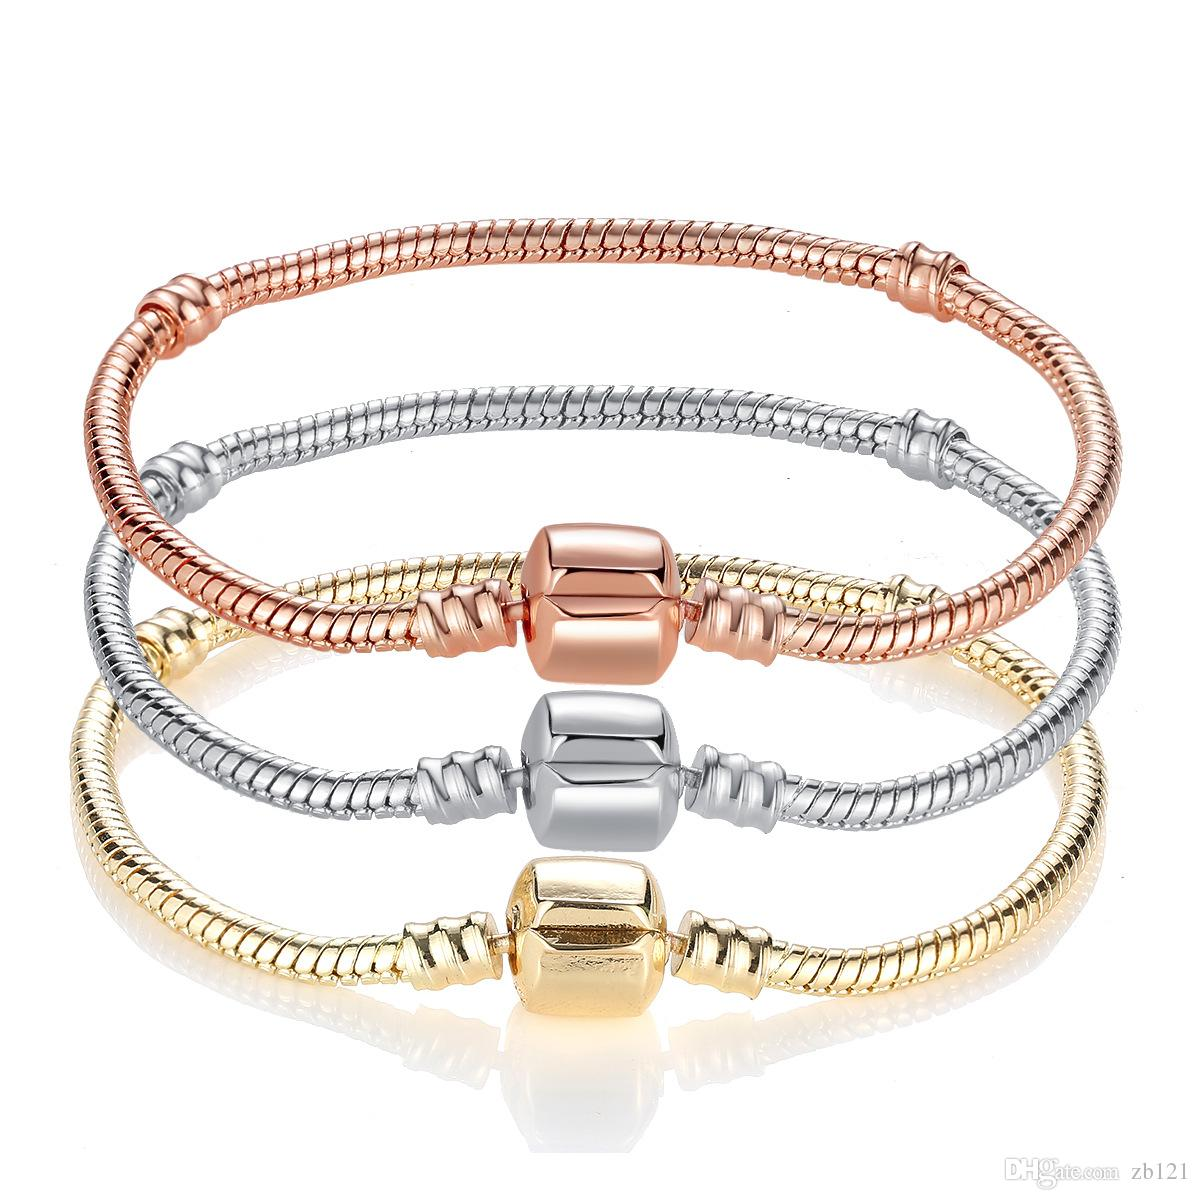 Wholesale-2018 925 Sterling Silver 3mm Snake Chain Fit Pandora Bracelet Charm Bead Bracelet Gift For Men Women 17~21cm